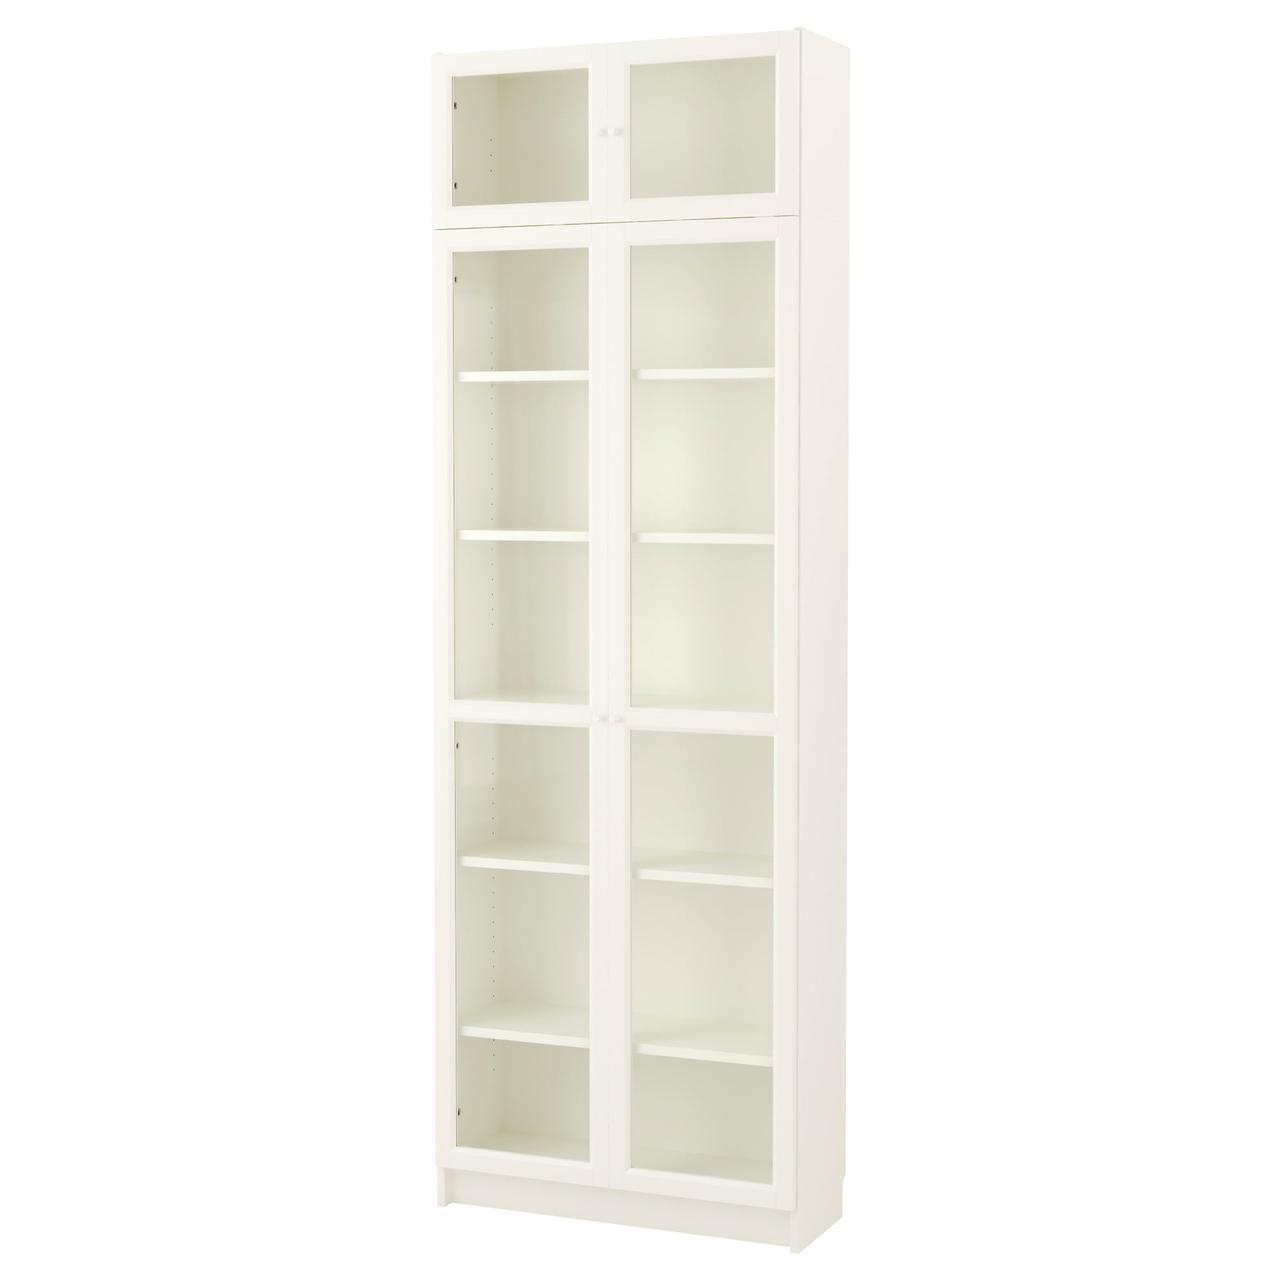 IKEA BILLY / OXBERG (692.177.14) Книжный шкаф